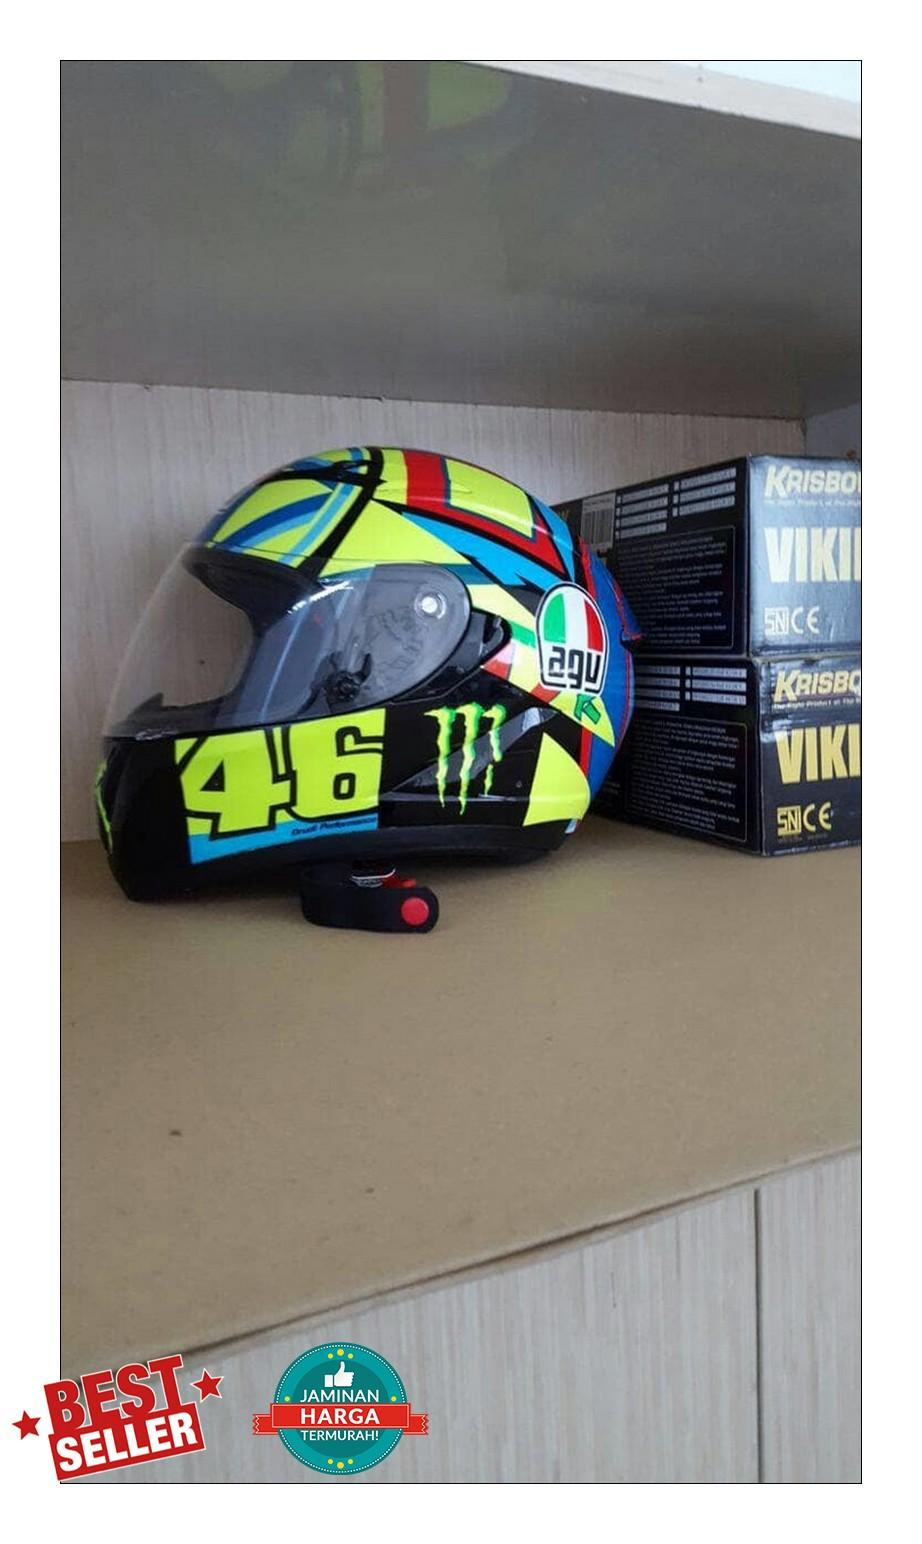 Kelebihan Agv Pista Gp R Project 46 Terkini Daftar Harga Dan Helm Carbon Doff Rossi Moto Vendeta2 Replika